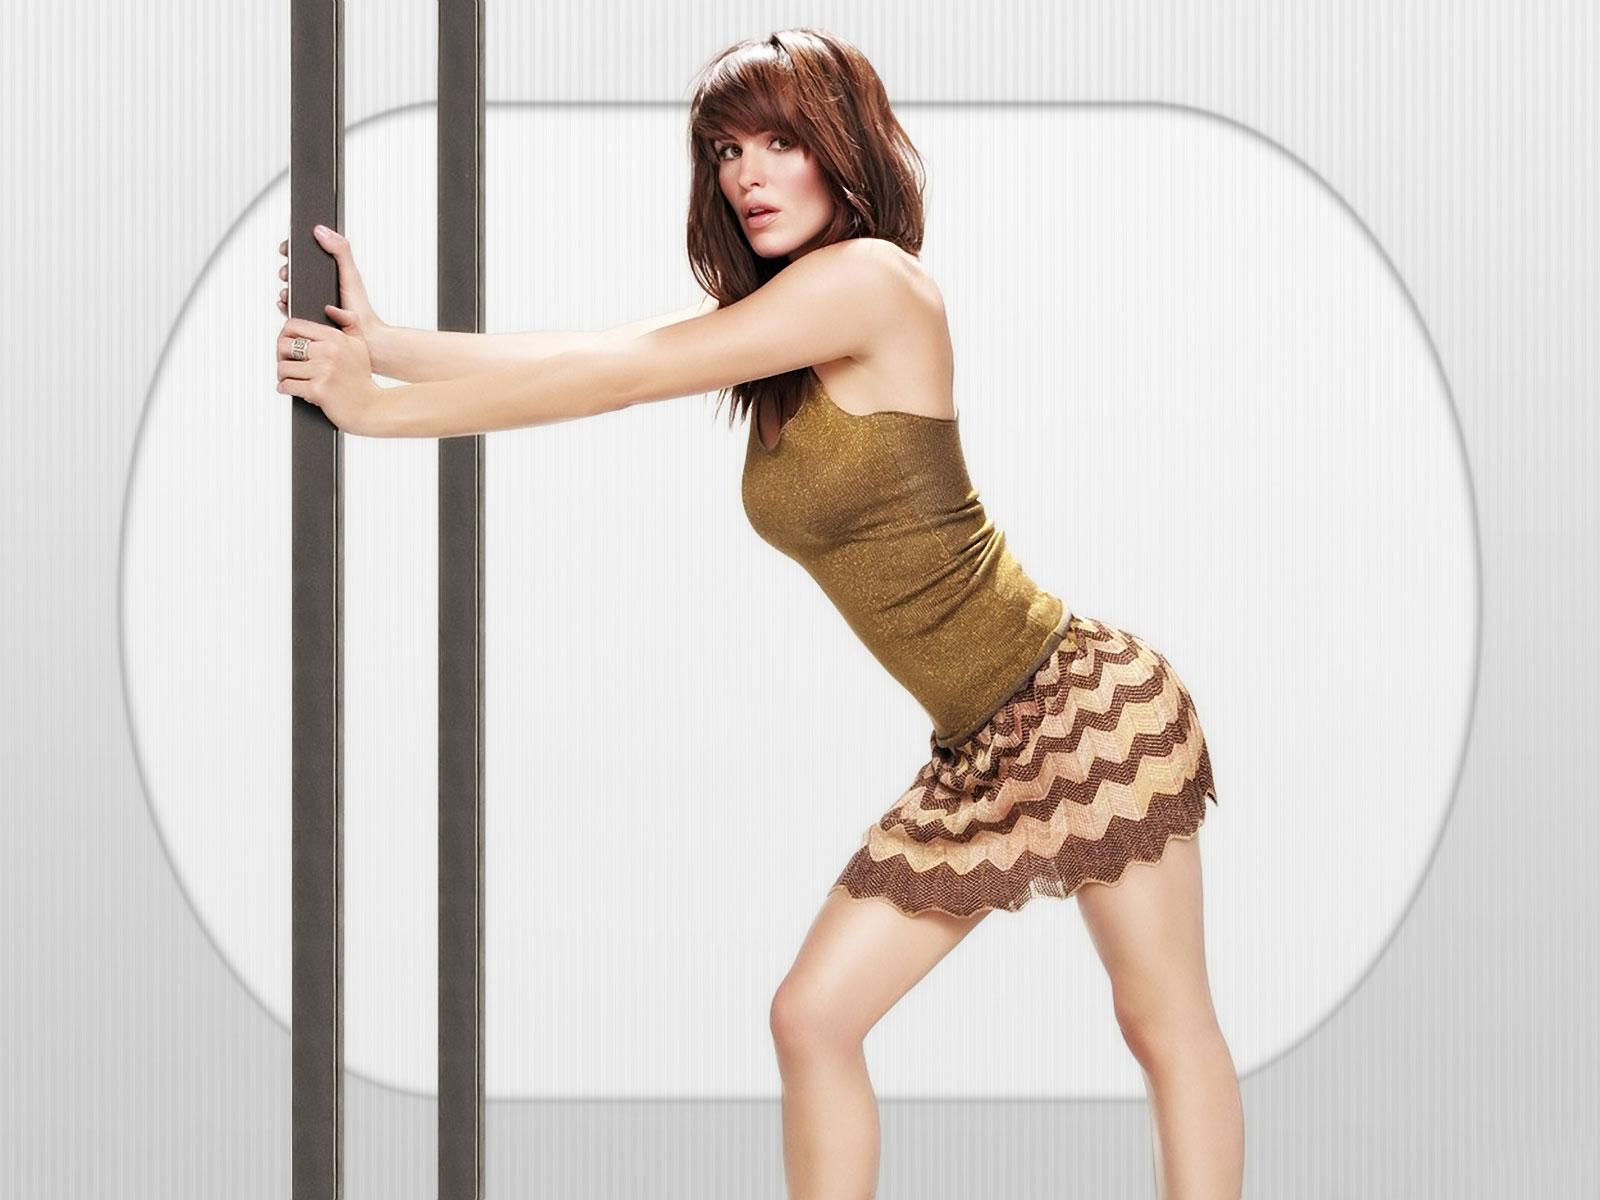 http://4.bp.blogspot.com/-5mQ6Qdf-LRs/TiXII0cu8hI/AAAAAAAACBs/LOAnazfypLw/s1600/jennifer-garner-wallpaper-normal.jpg